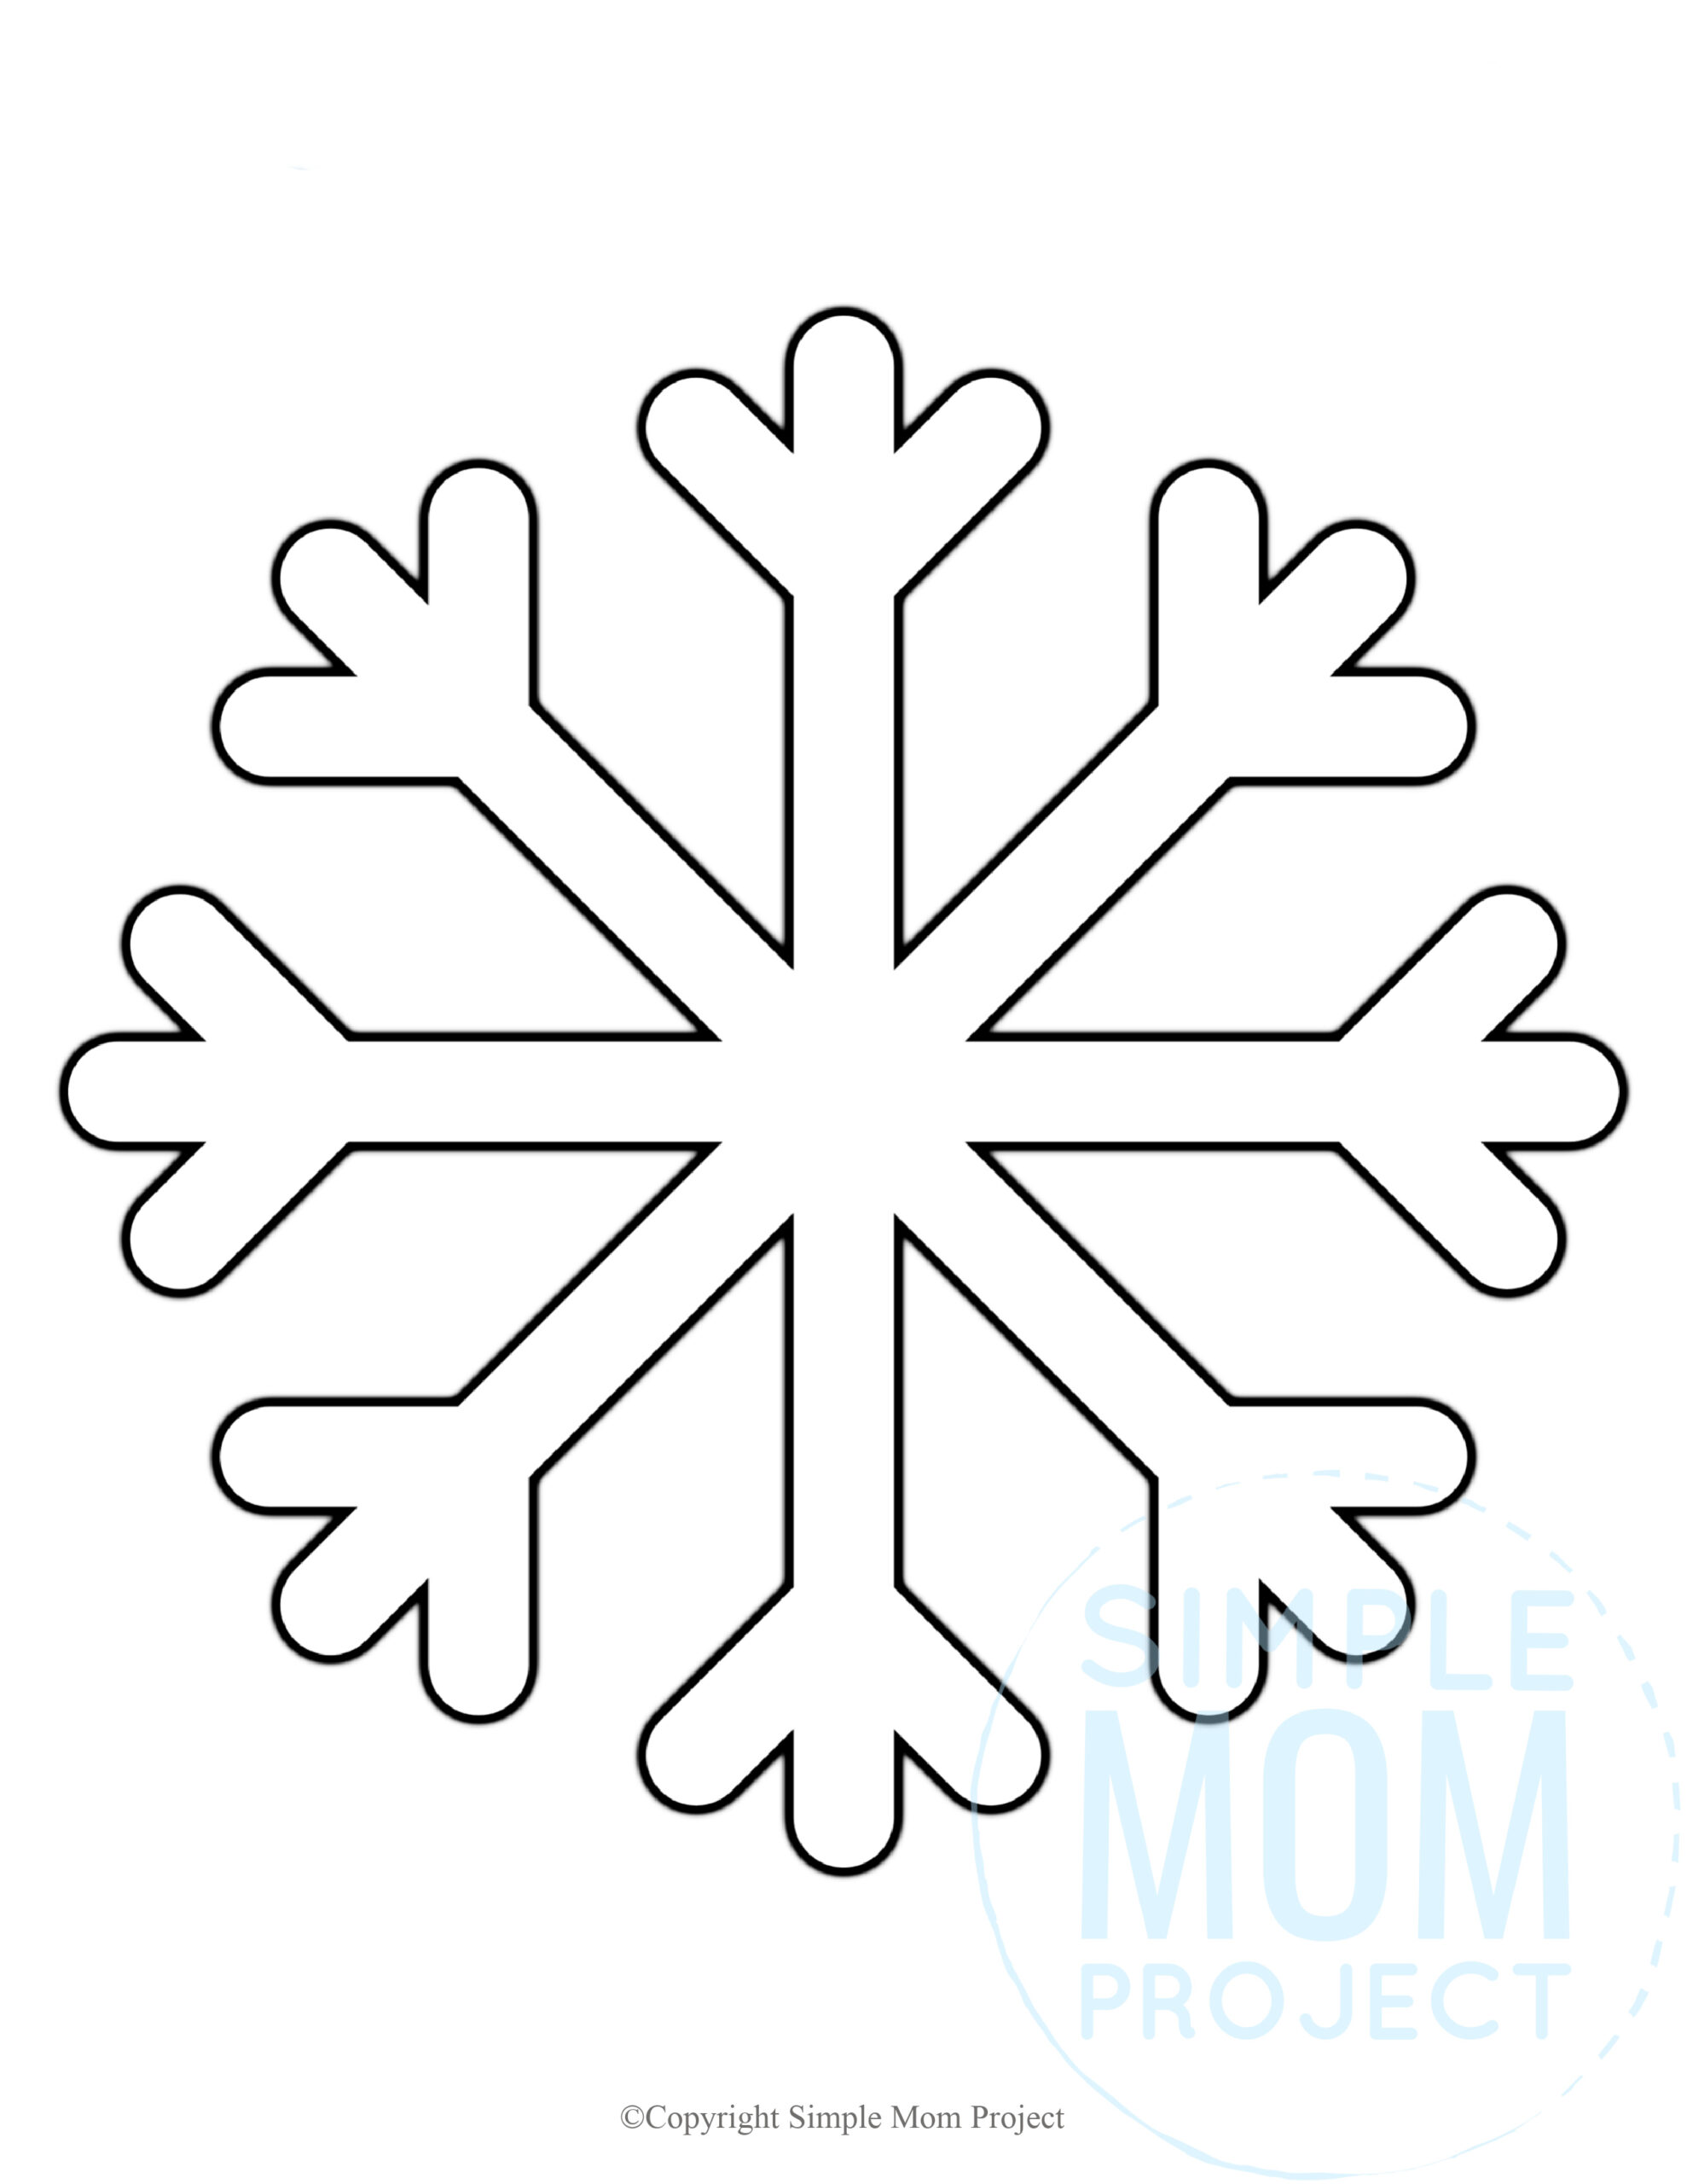 Free Printable Snowflake template, snowflake pattern, snowflake stencil, snowflake outline for kids winter crafts